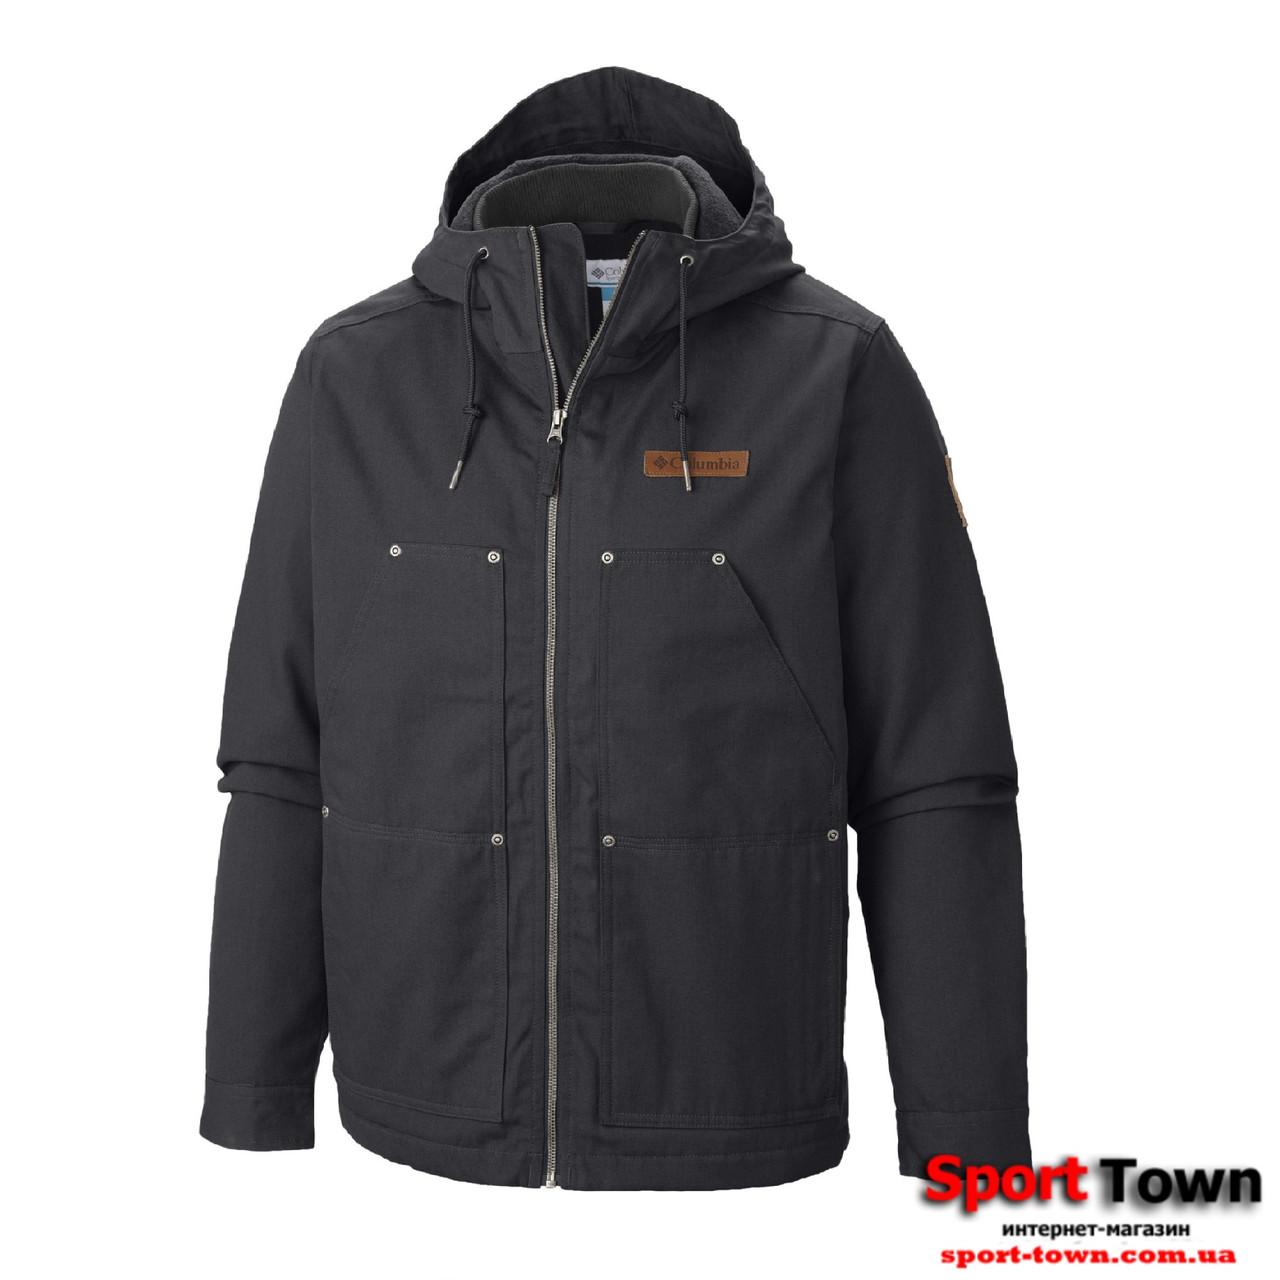 Columbia Loma Vista Hooded Jacket  WO4121-011 Оригинал